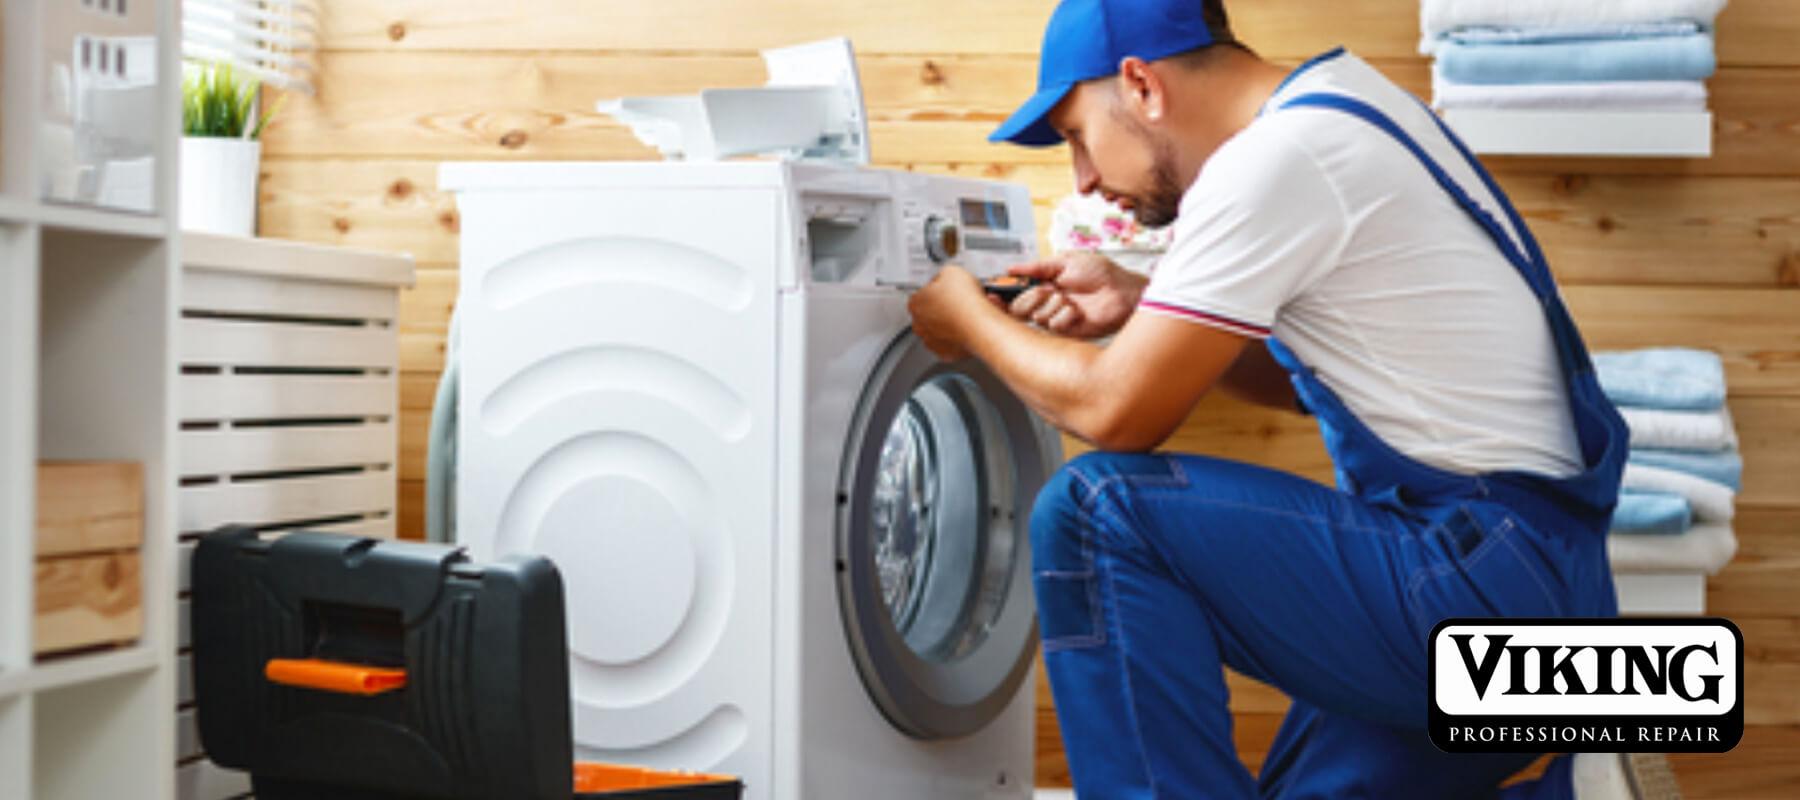 Authorized Viking Appliance Repair Service San Francisco | Professional Viking Repair